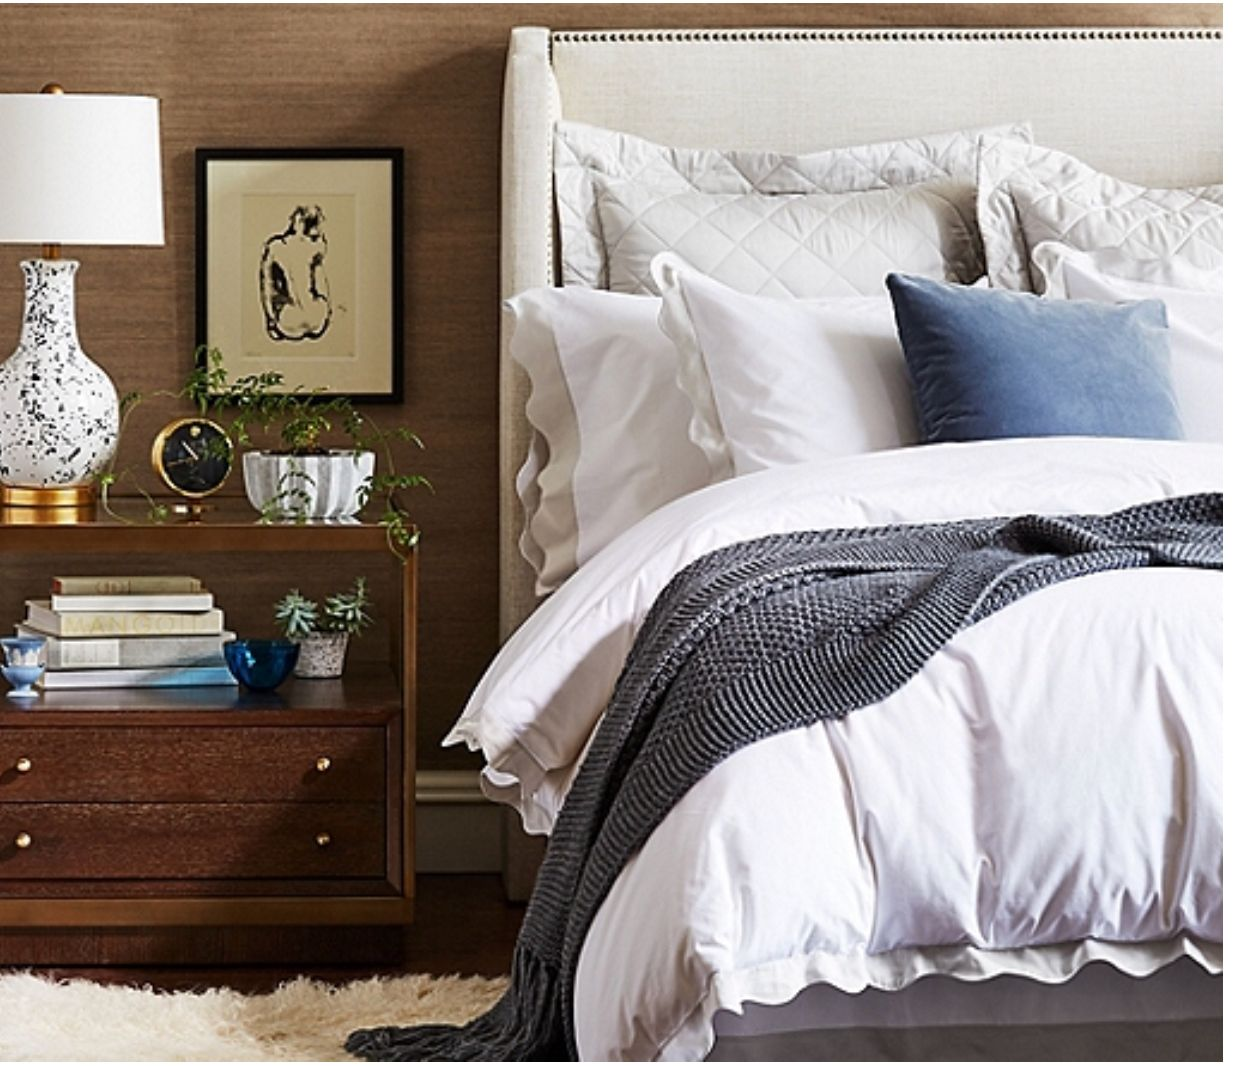 Pin by Jennifer Tan on Guest Bedroom Guest bedroom decor